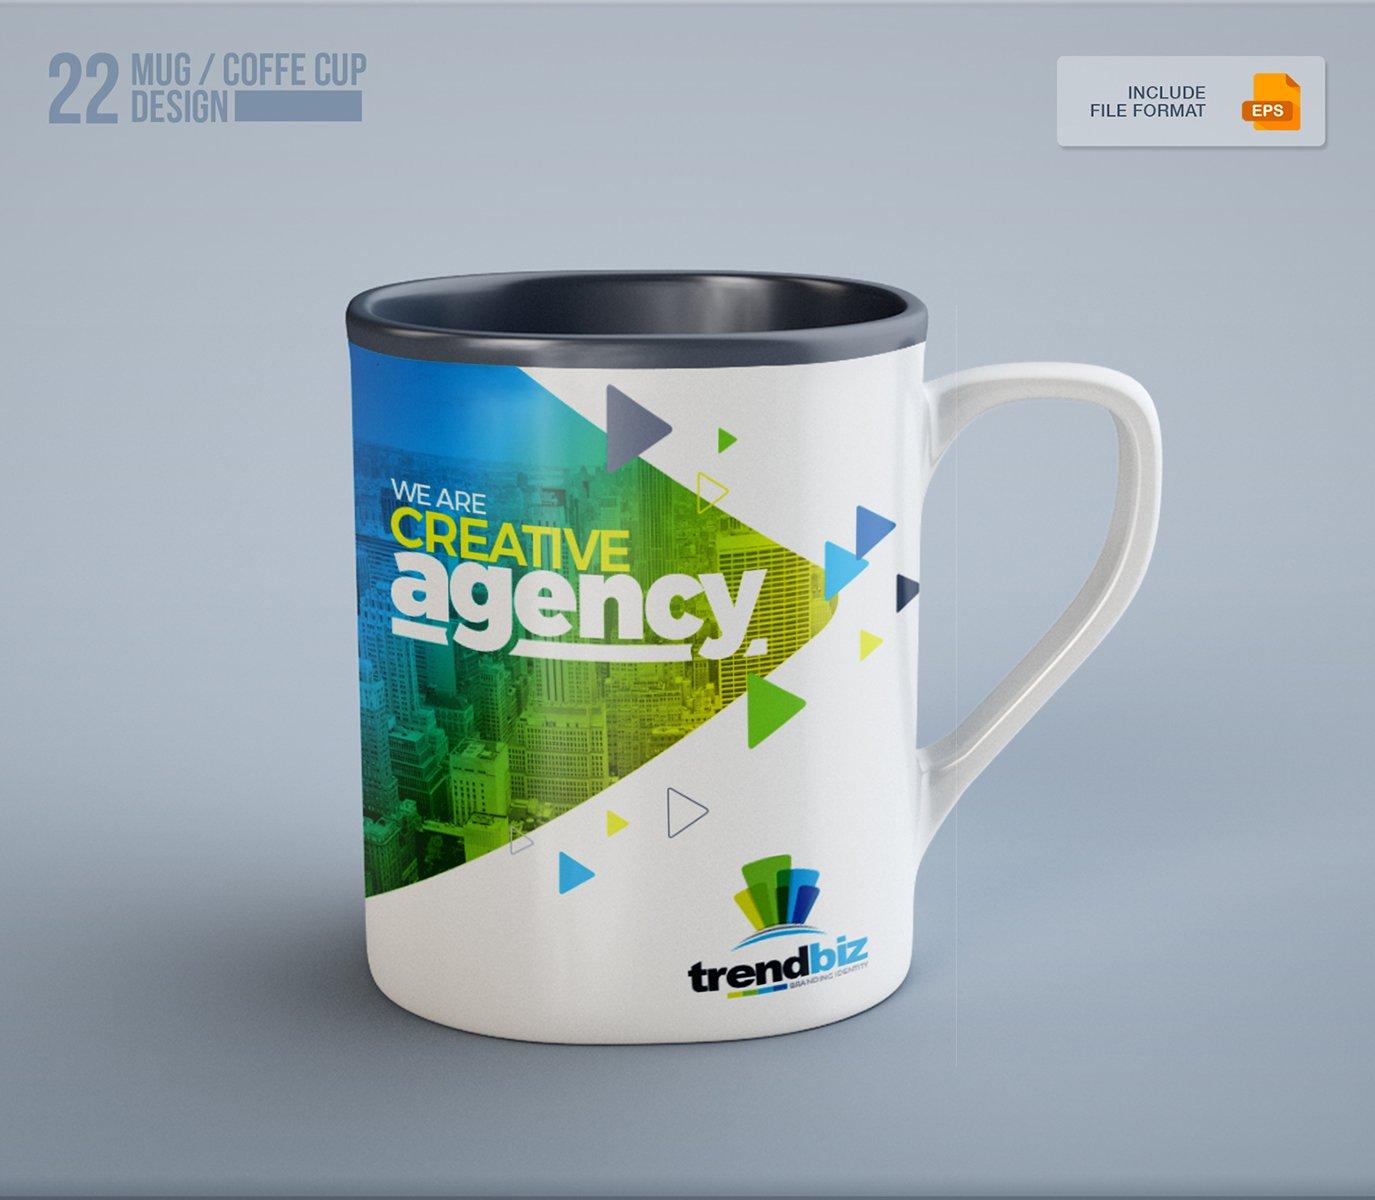 Stationery Branding Identity Bundle - $39 - 42 Mug and Coffee Cup